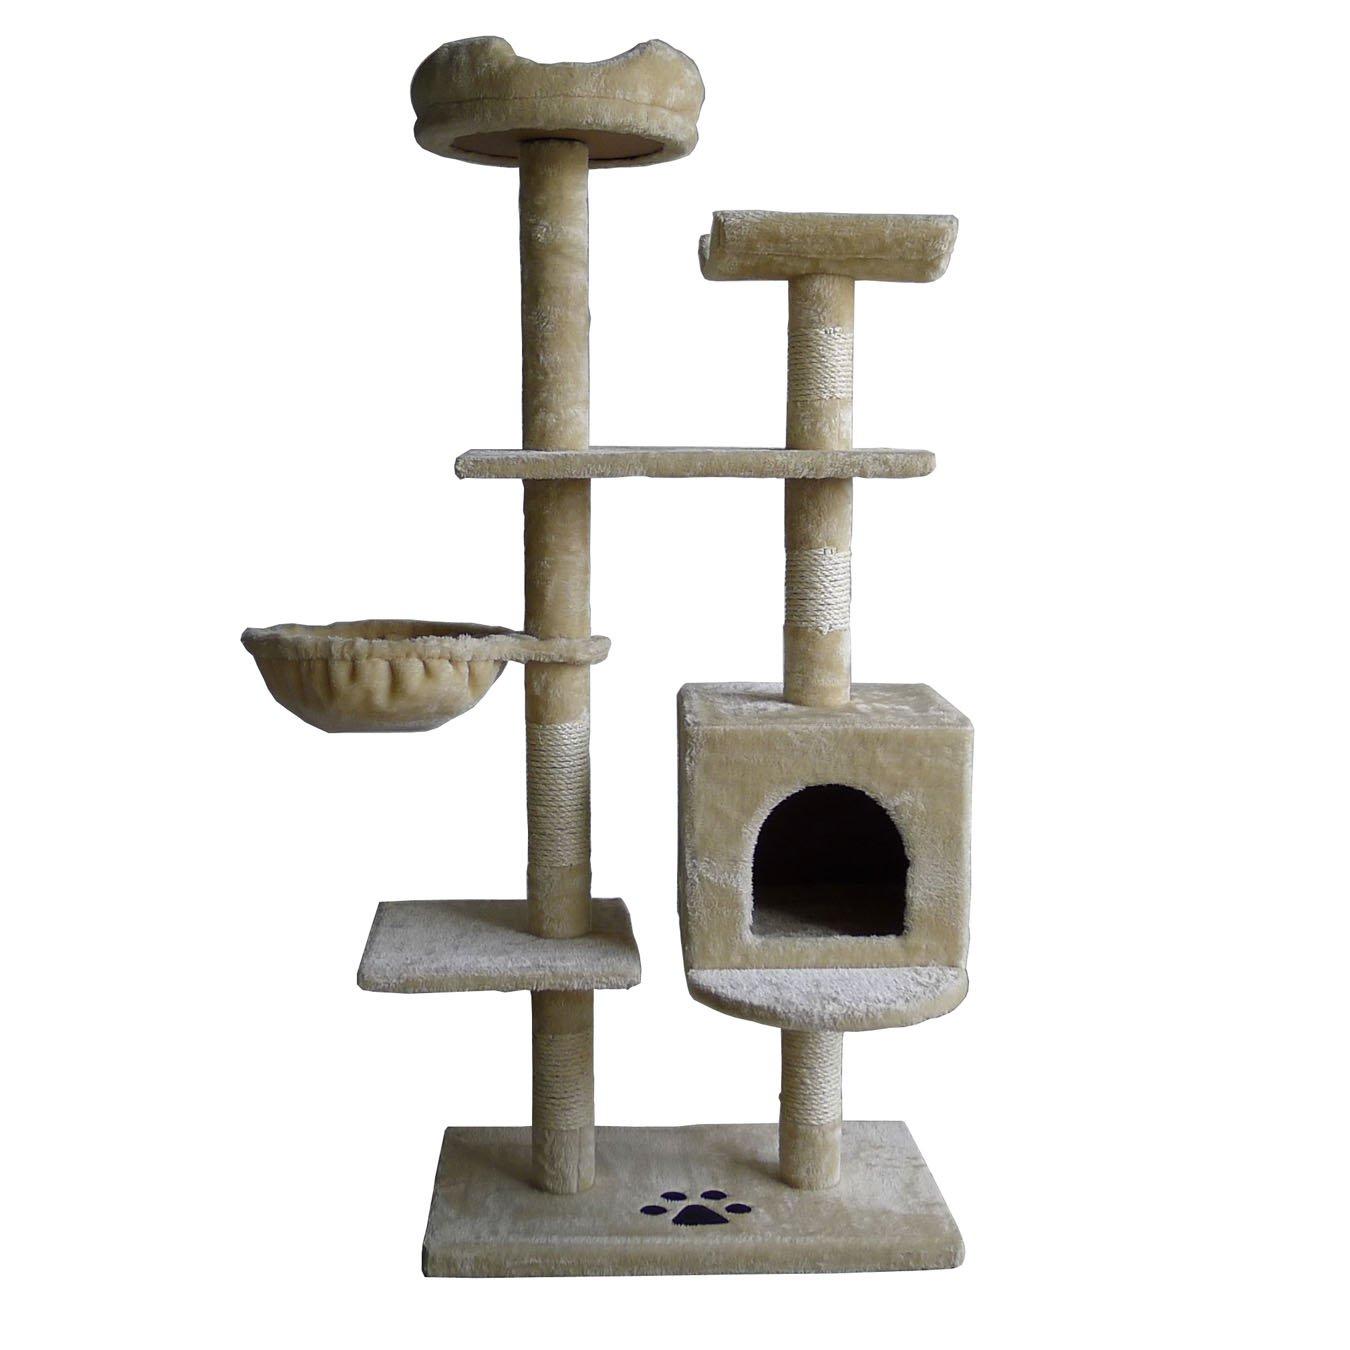 OTLIVE 53'' Cat Tree Condo Tower Scratcher Post Furniture Kitten Toy House (Beige)